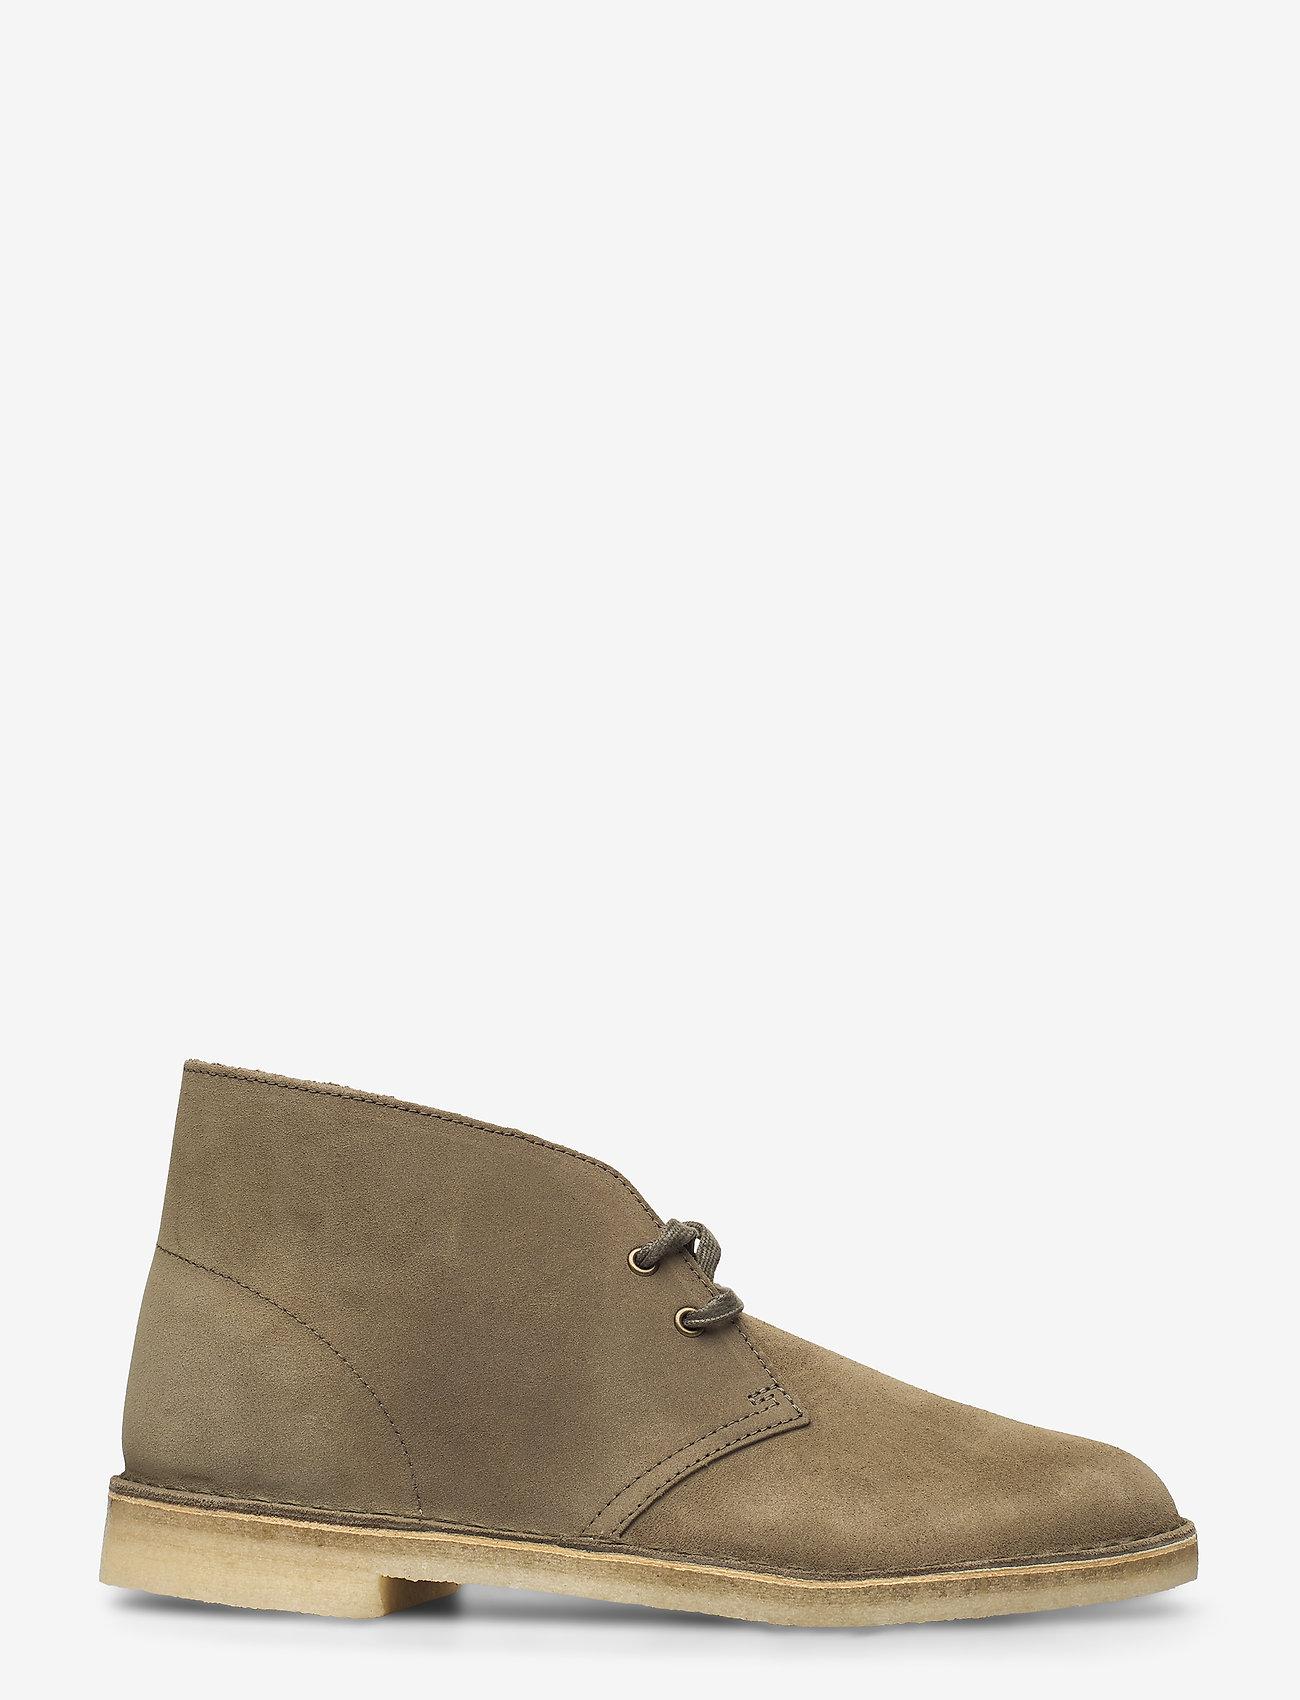 Clarks Originals - Desert Boot - desert boots - light olive sde - 1